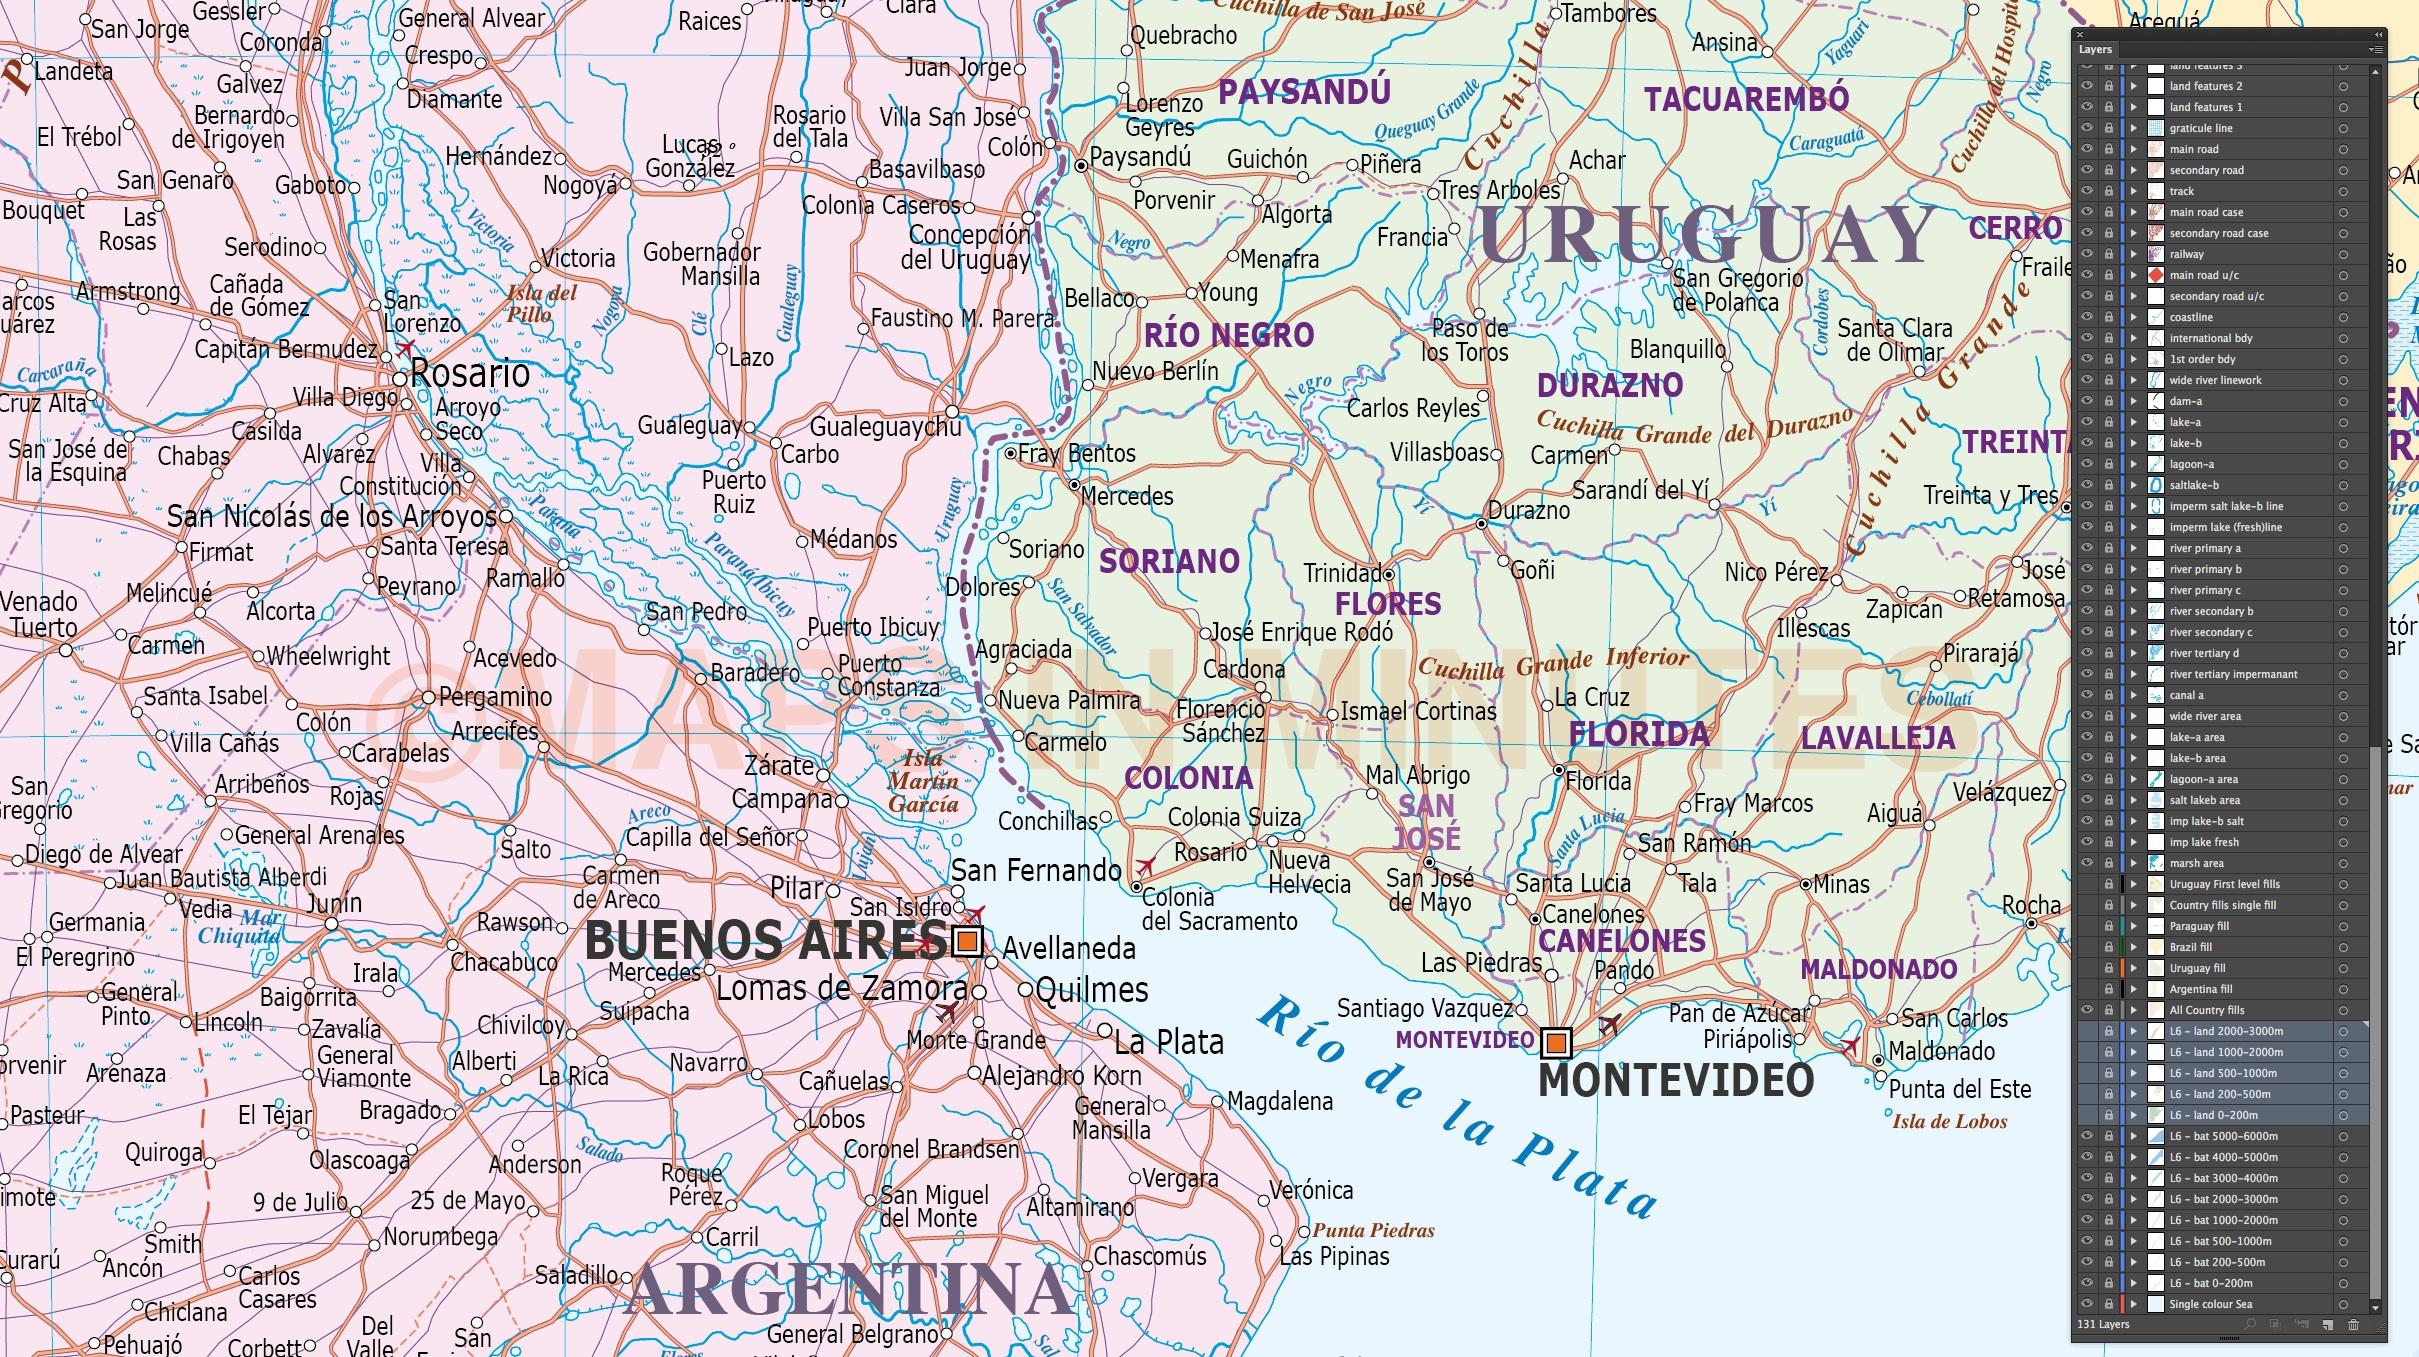 Uruguay digital vector political road rail map in Illustrator